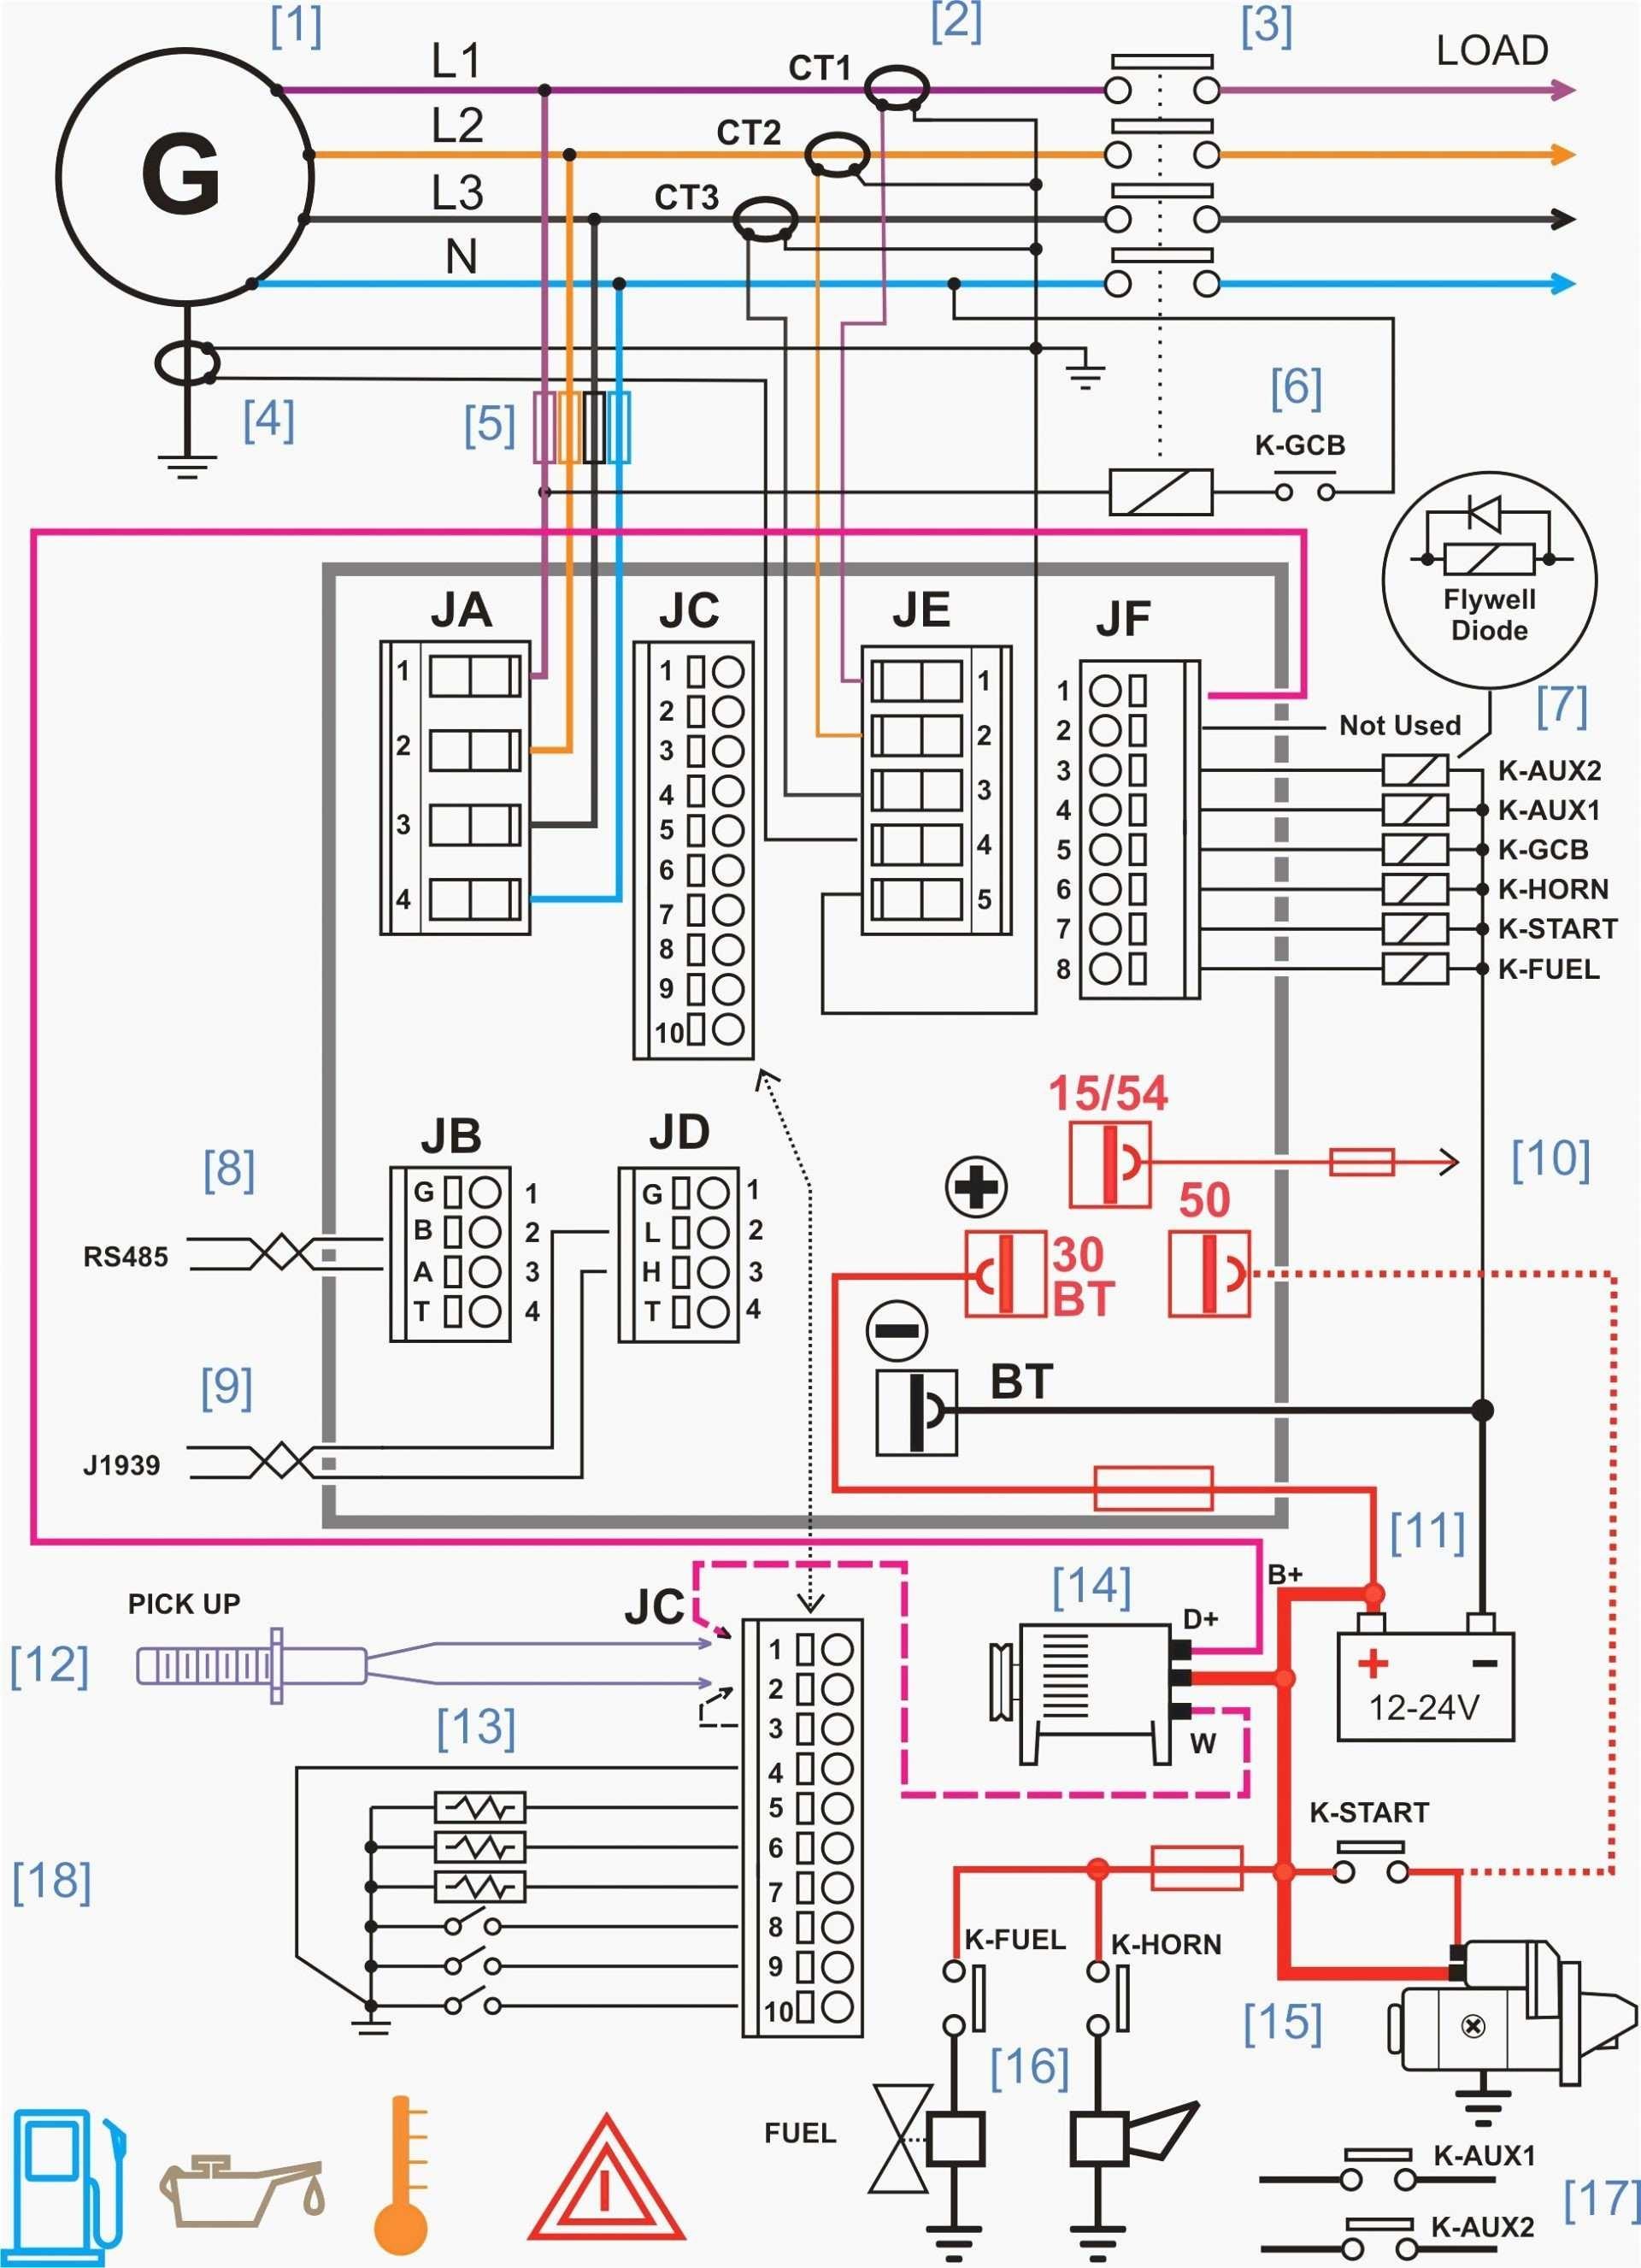 access control card reader wiring diagram - card reader door entry system  unique lenel access control